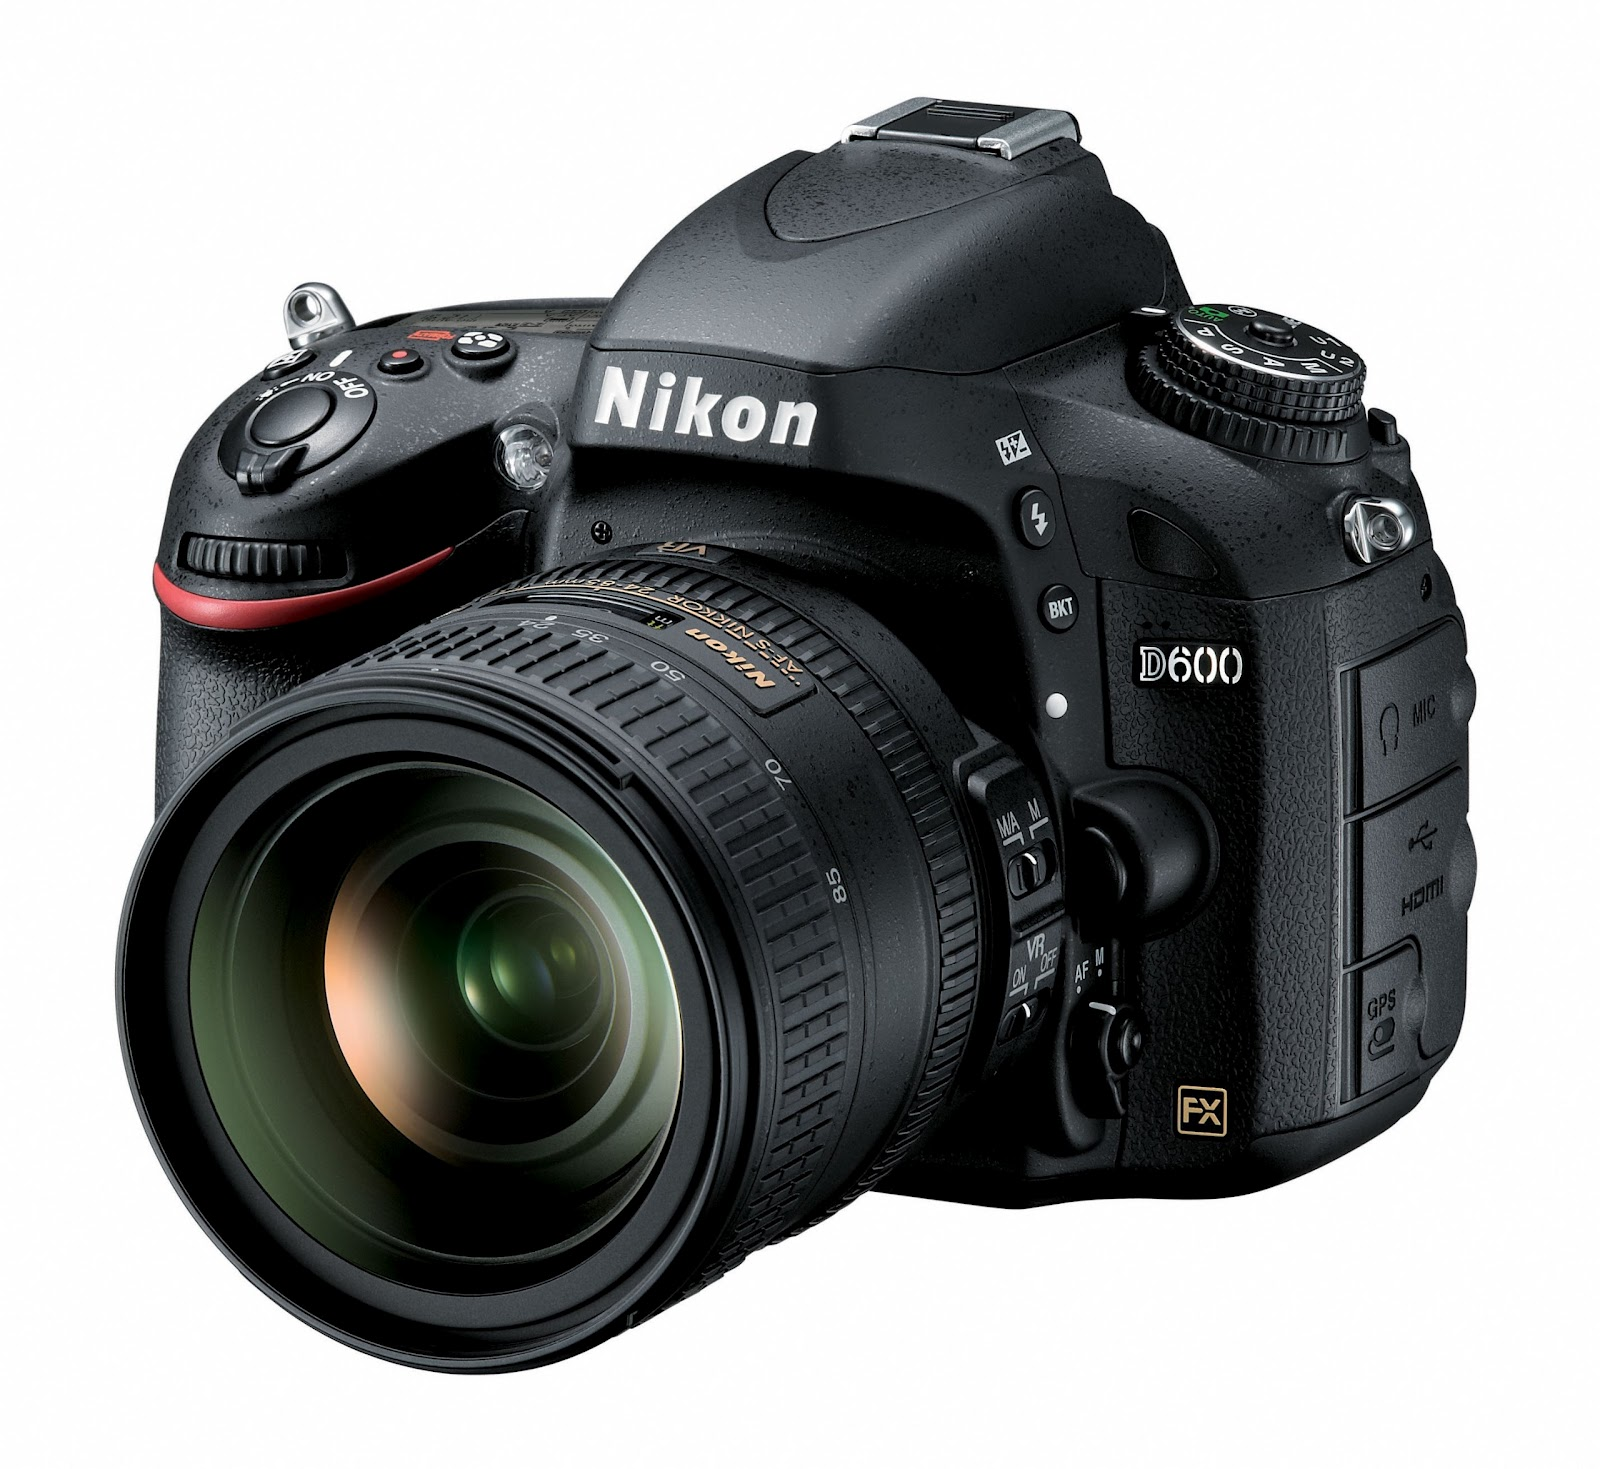 Nikon+D600+DSLR+FX+Camera.jpg